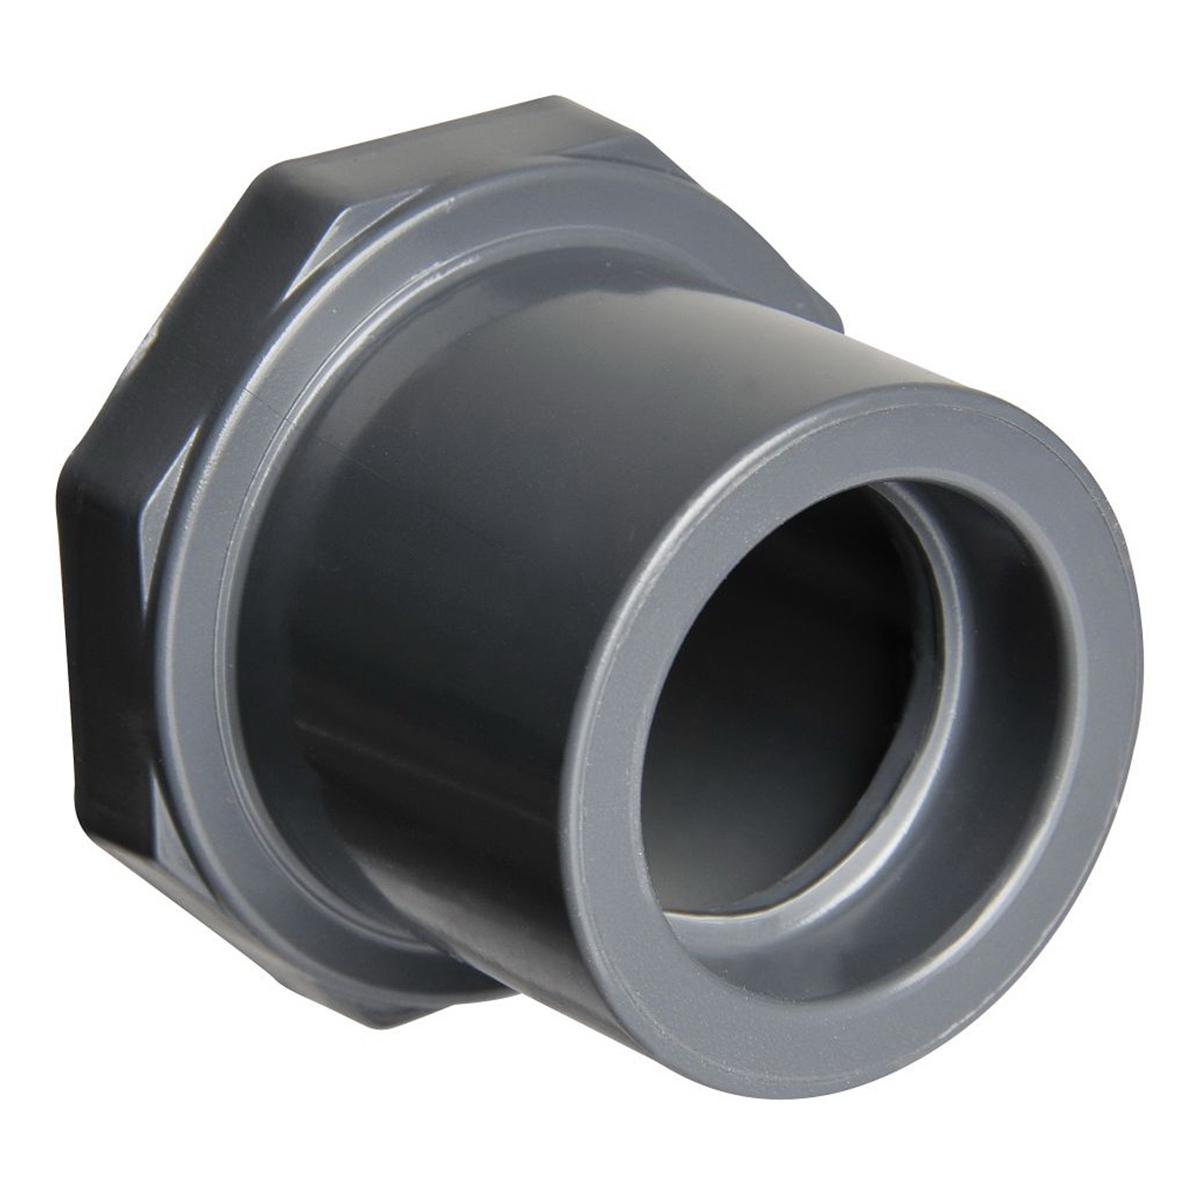 CPVC SCH 80 Flush Style Reducer Bushing, 3/8 in x 1/4 in, Spigot x Socket